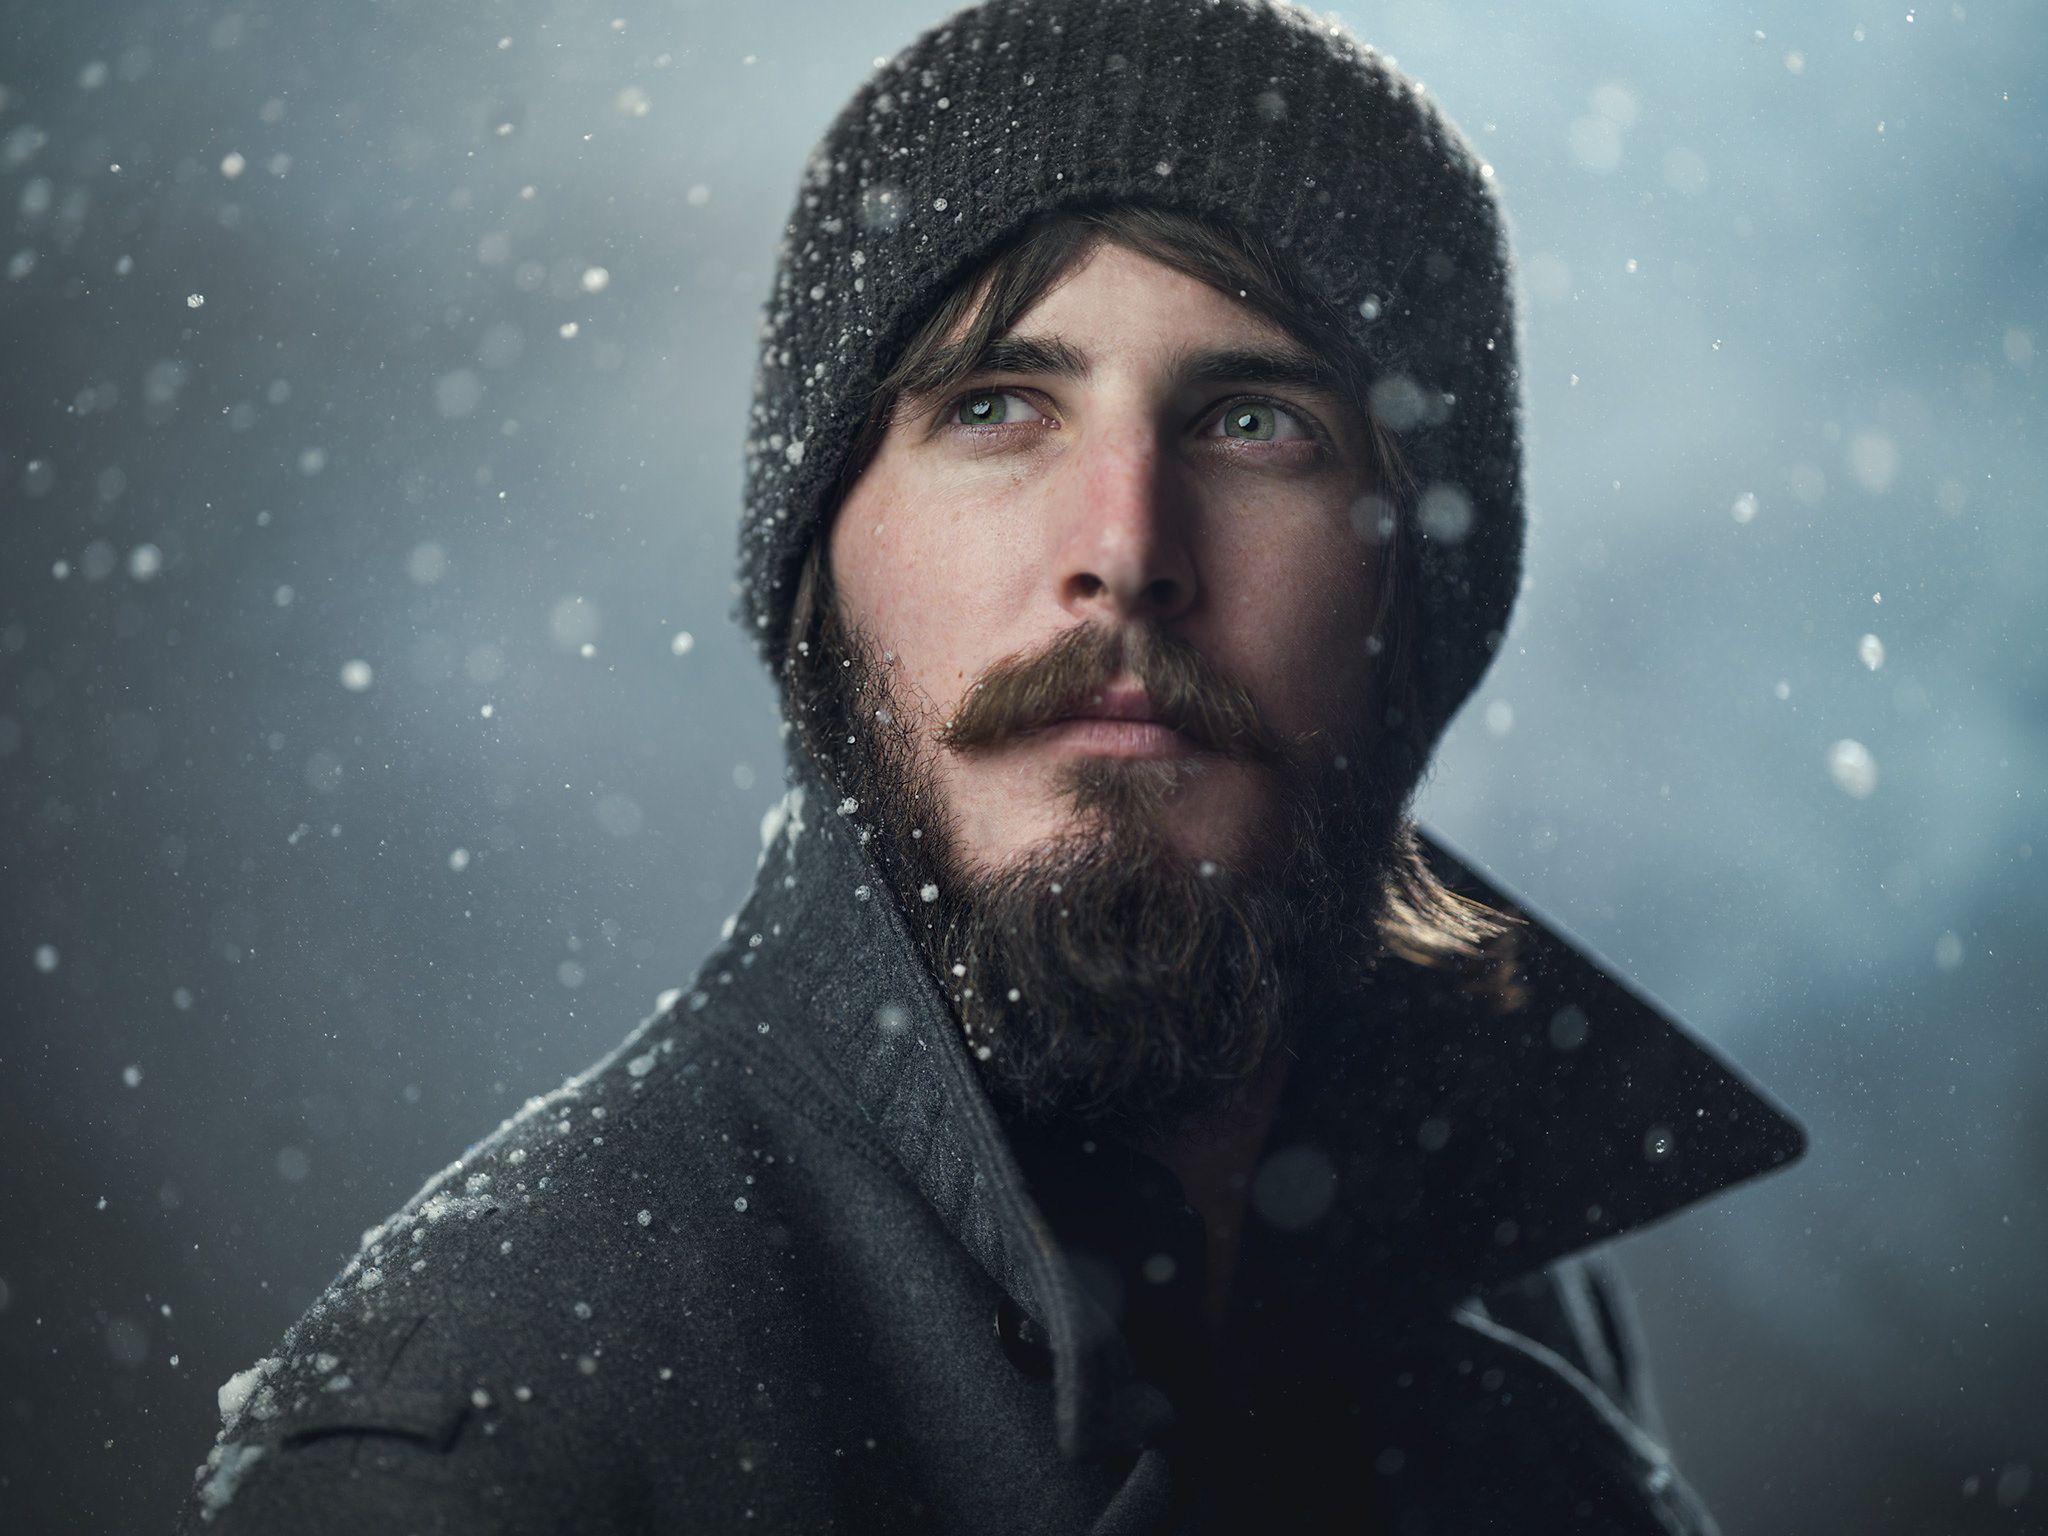 множество способов мужская зимняя фотосъемка снимаете